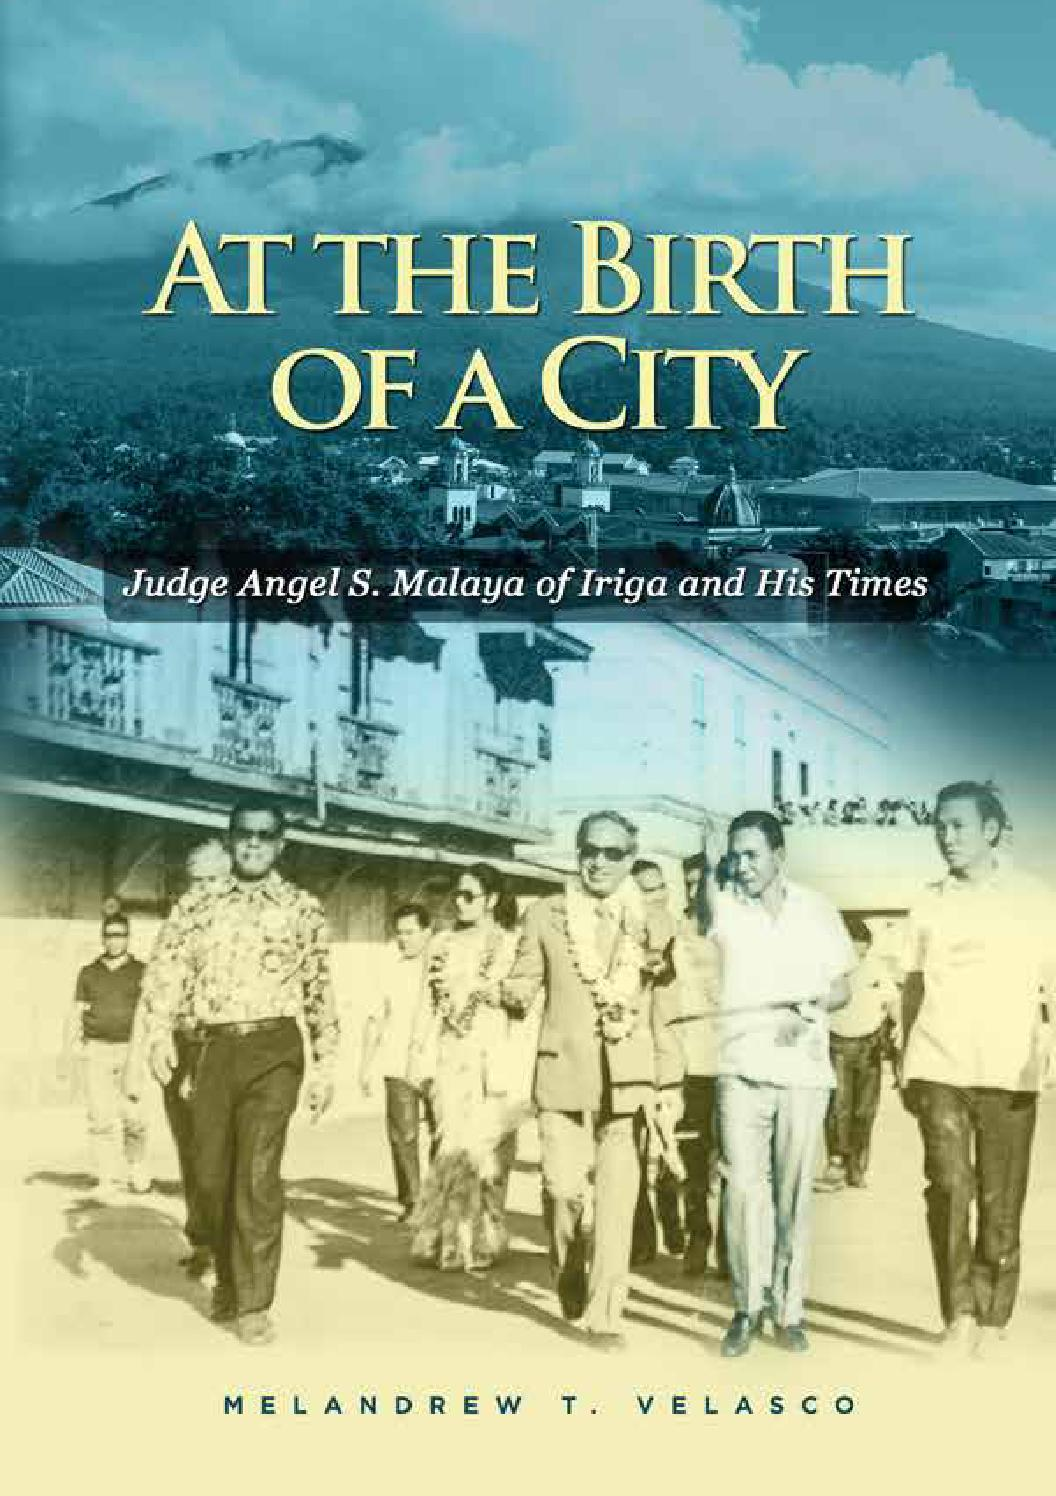 At the Birth of a City: Judge Angel S. Malaya of Iriga and His Times ...